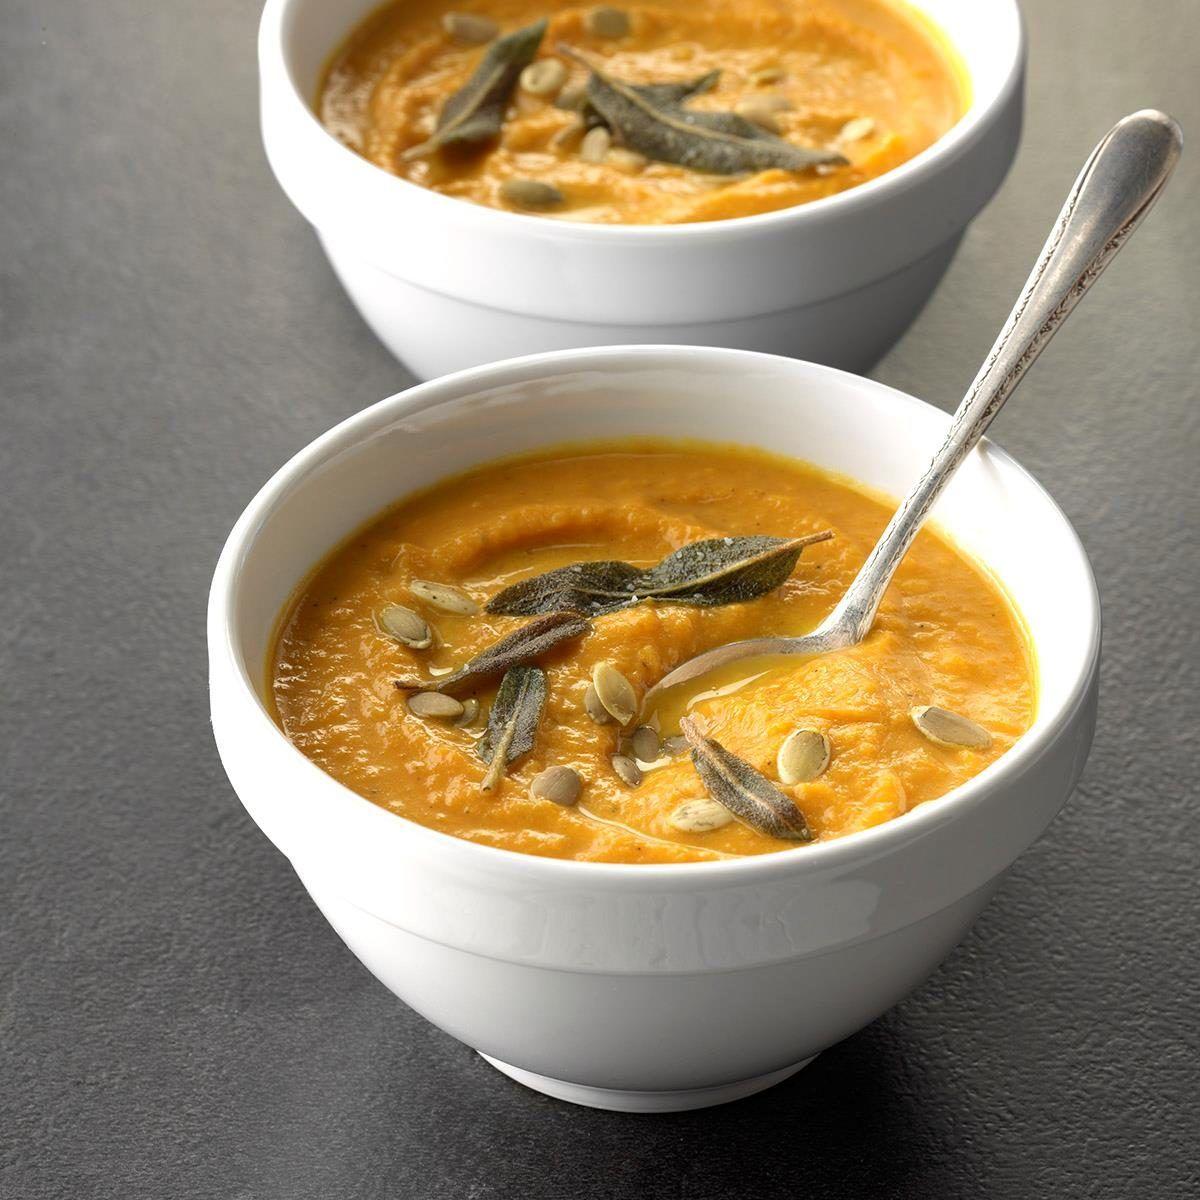 Smooth Creamy Pumpkin Soup Recipe Pumpkin Recipes Easy Pumpkin Recipes Creamy Pumpkin Soup